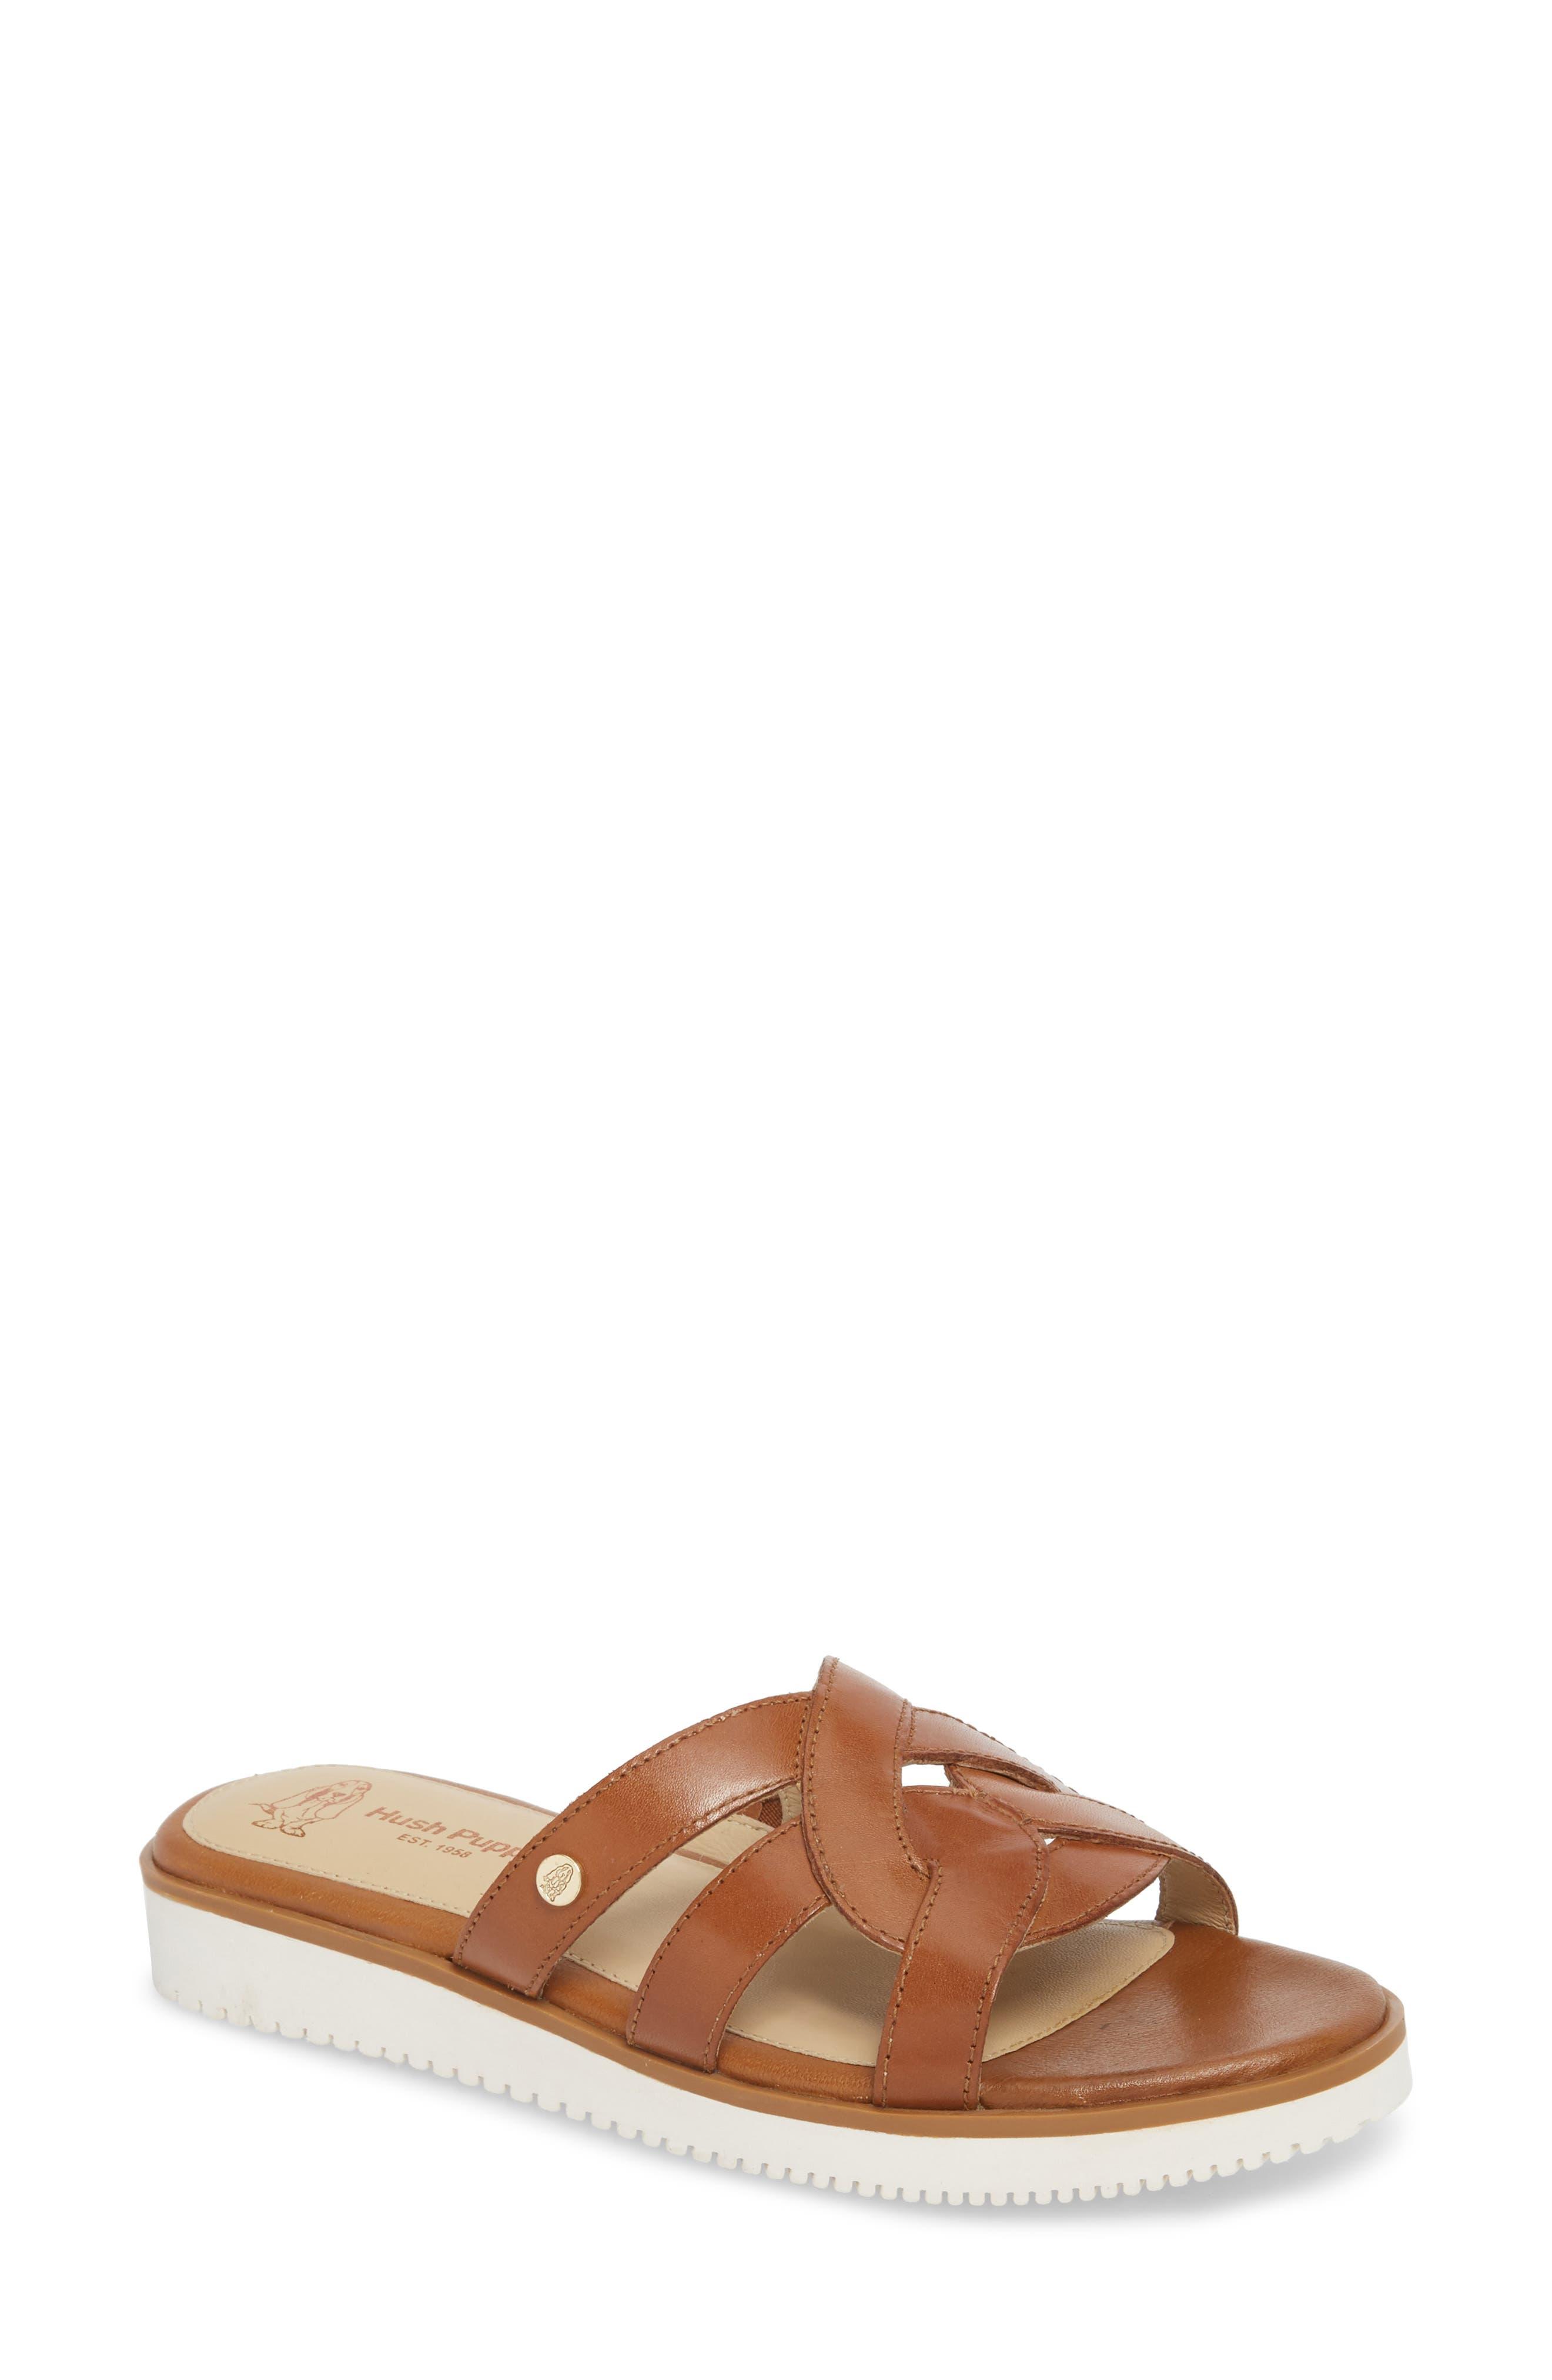 Braid Slide Sandal,                         Main,                         color, Tan Leather